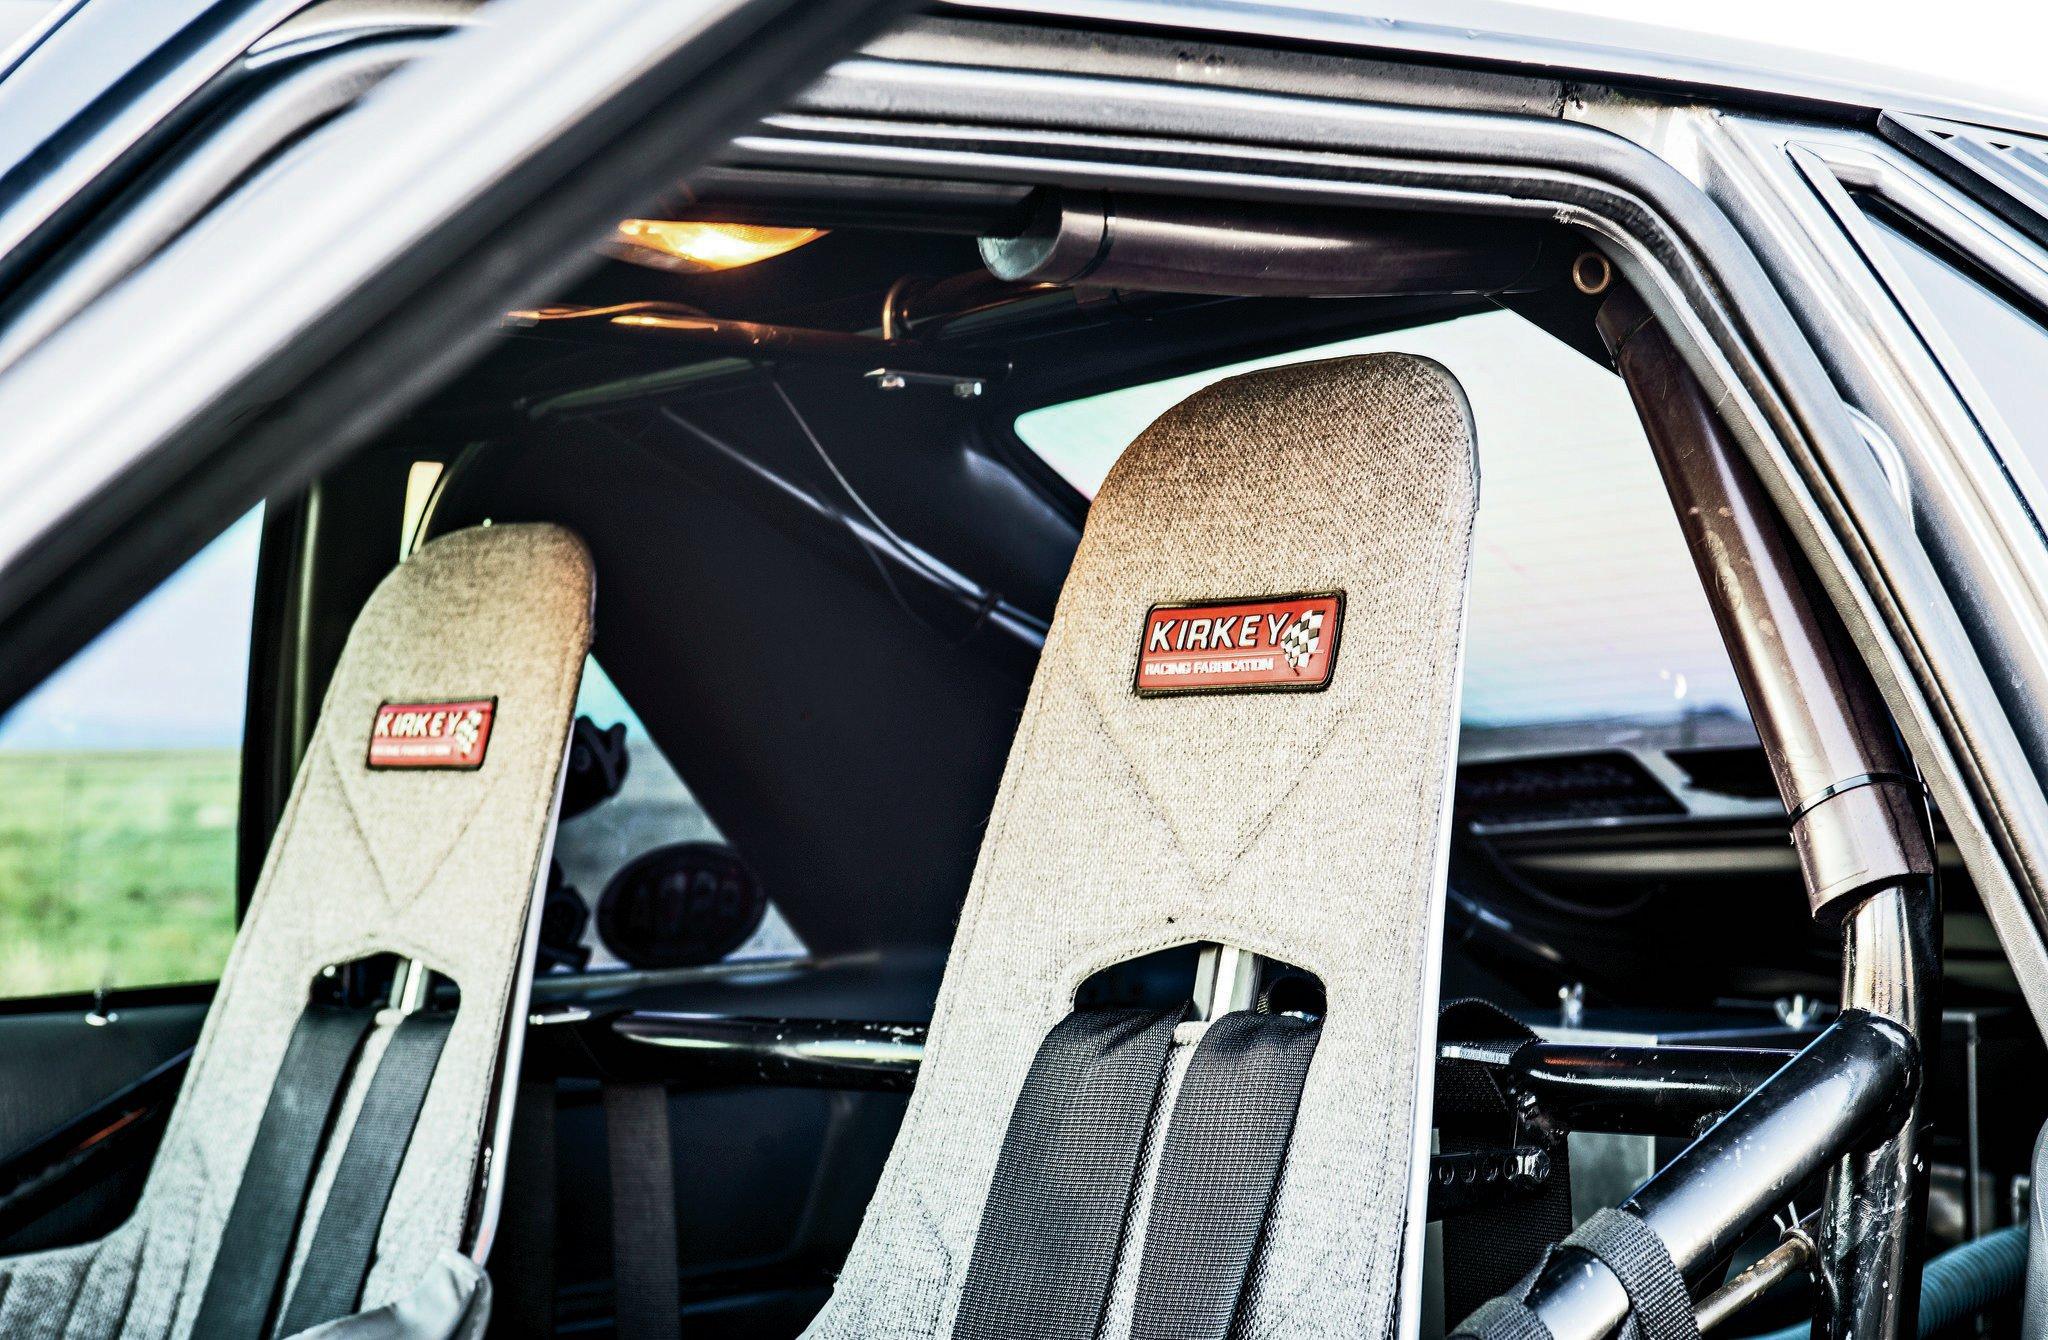 1986 Ford Mustang Gt Kirkey Seats